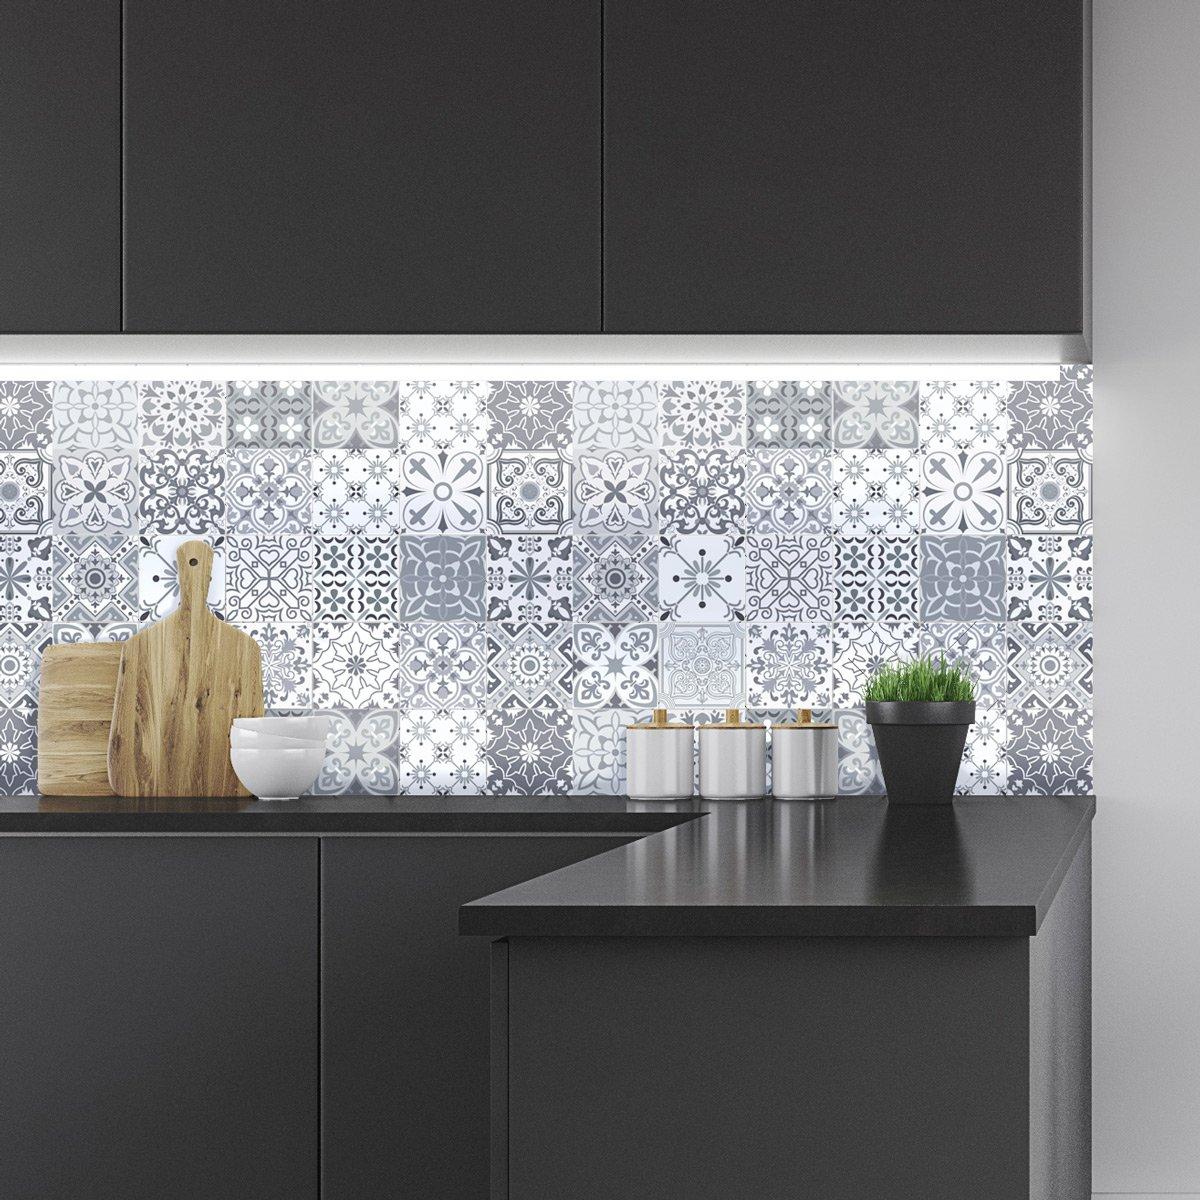 ambiance-live col-tiles-ros-a907_ 15x 15cm adesivi adesivi piastrelle, Multicolore, 15x 15cm, set di 24pezzi col-tiles-ROS-A907_15x15cm